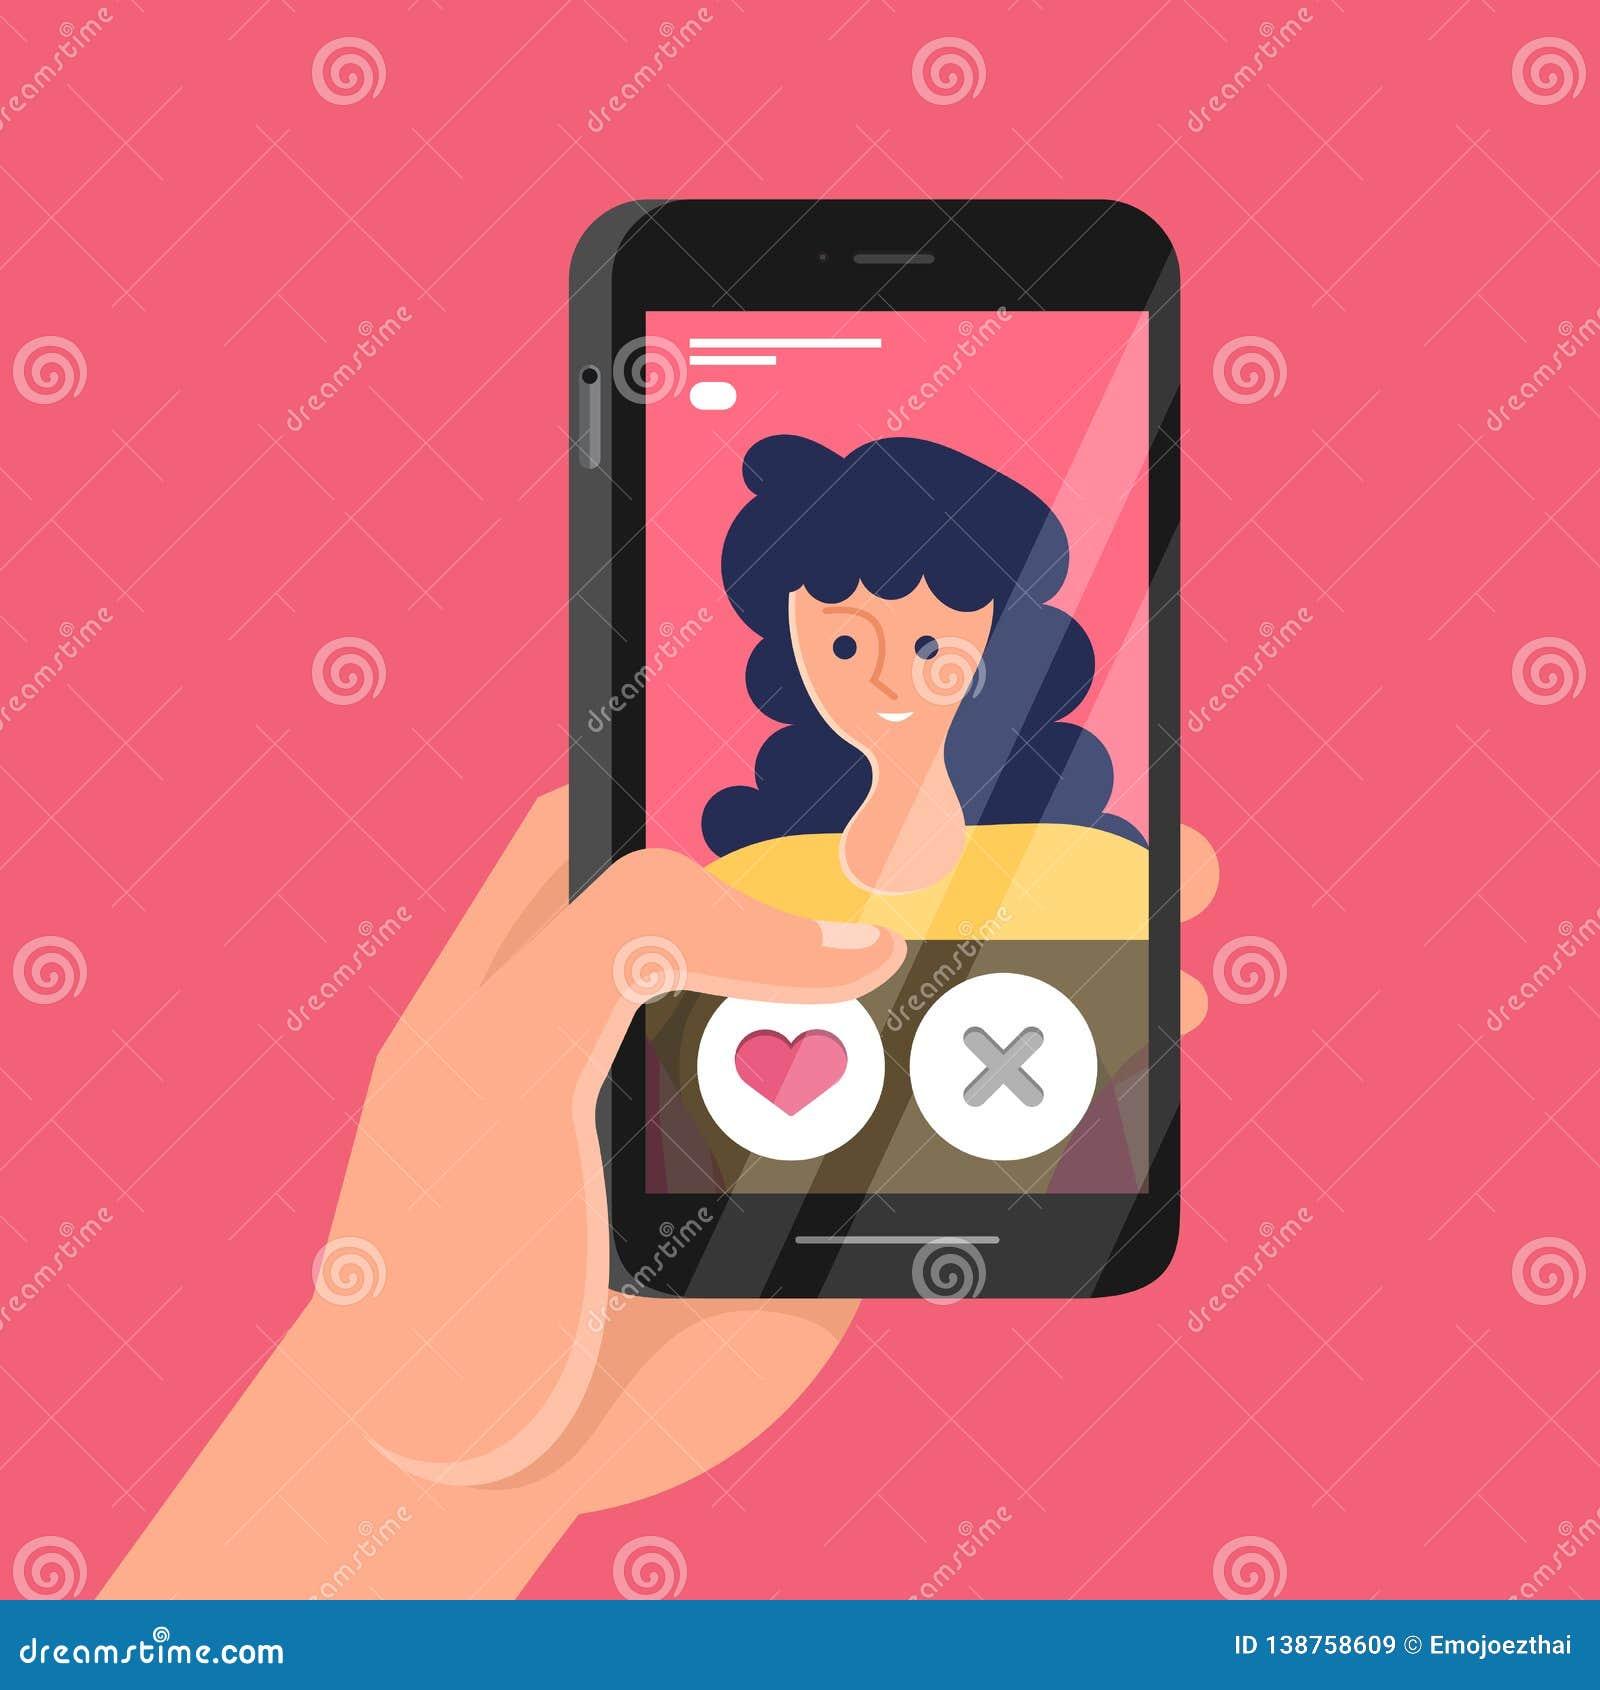 nye telefon dating chat linjer